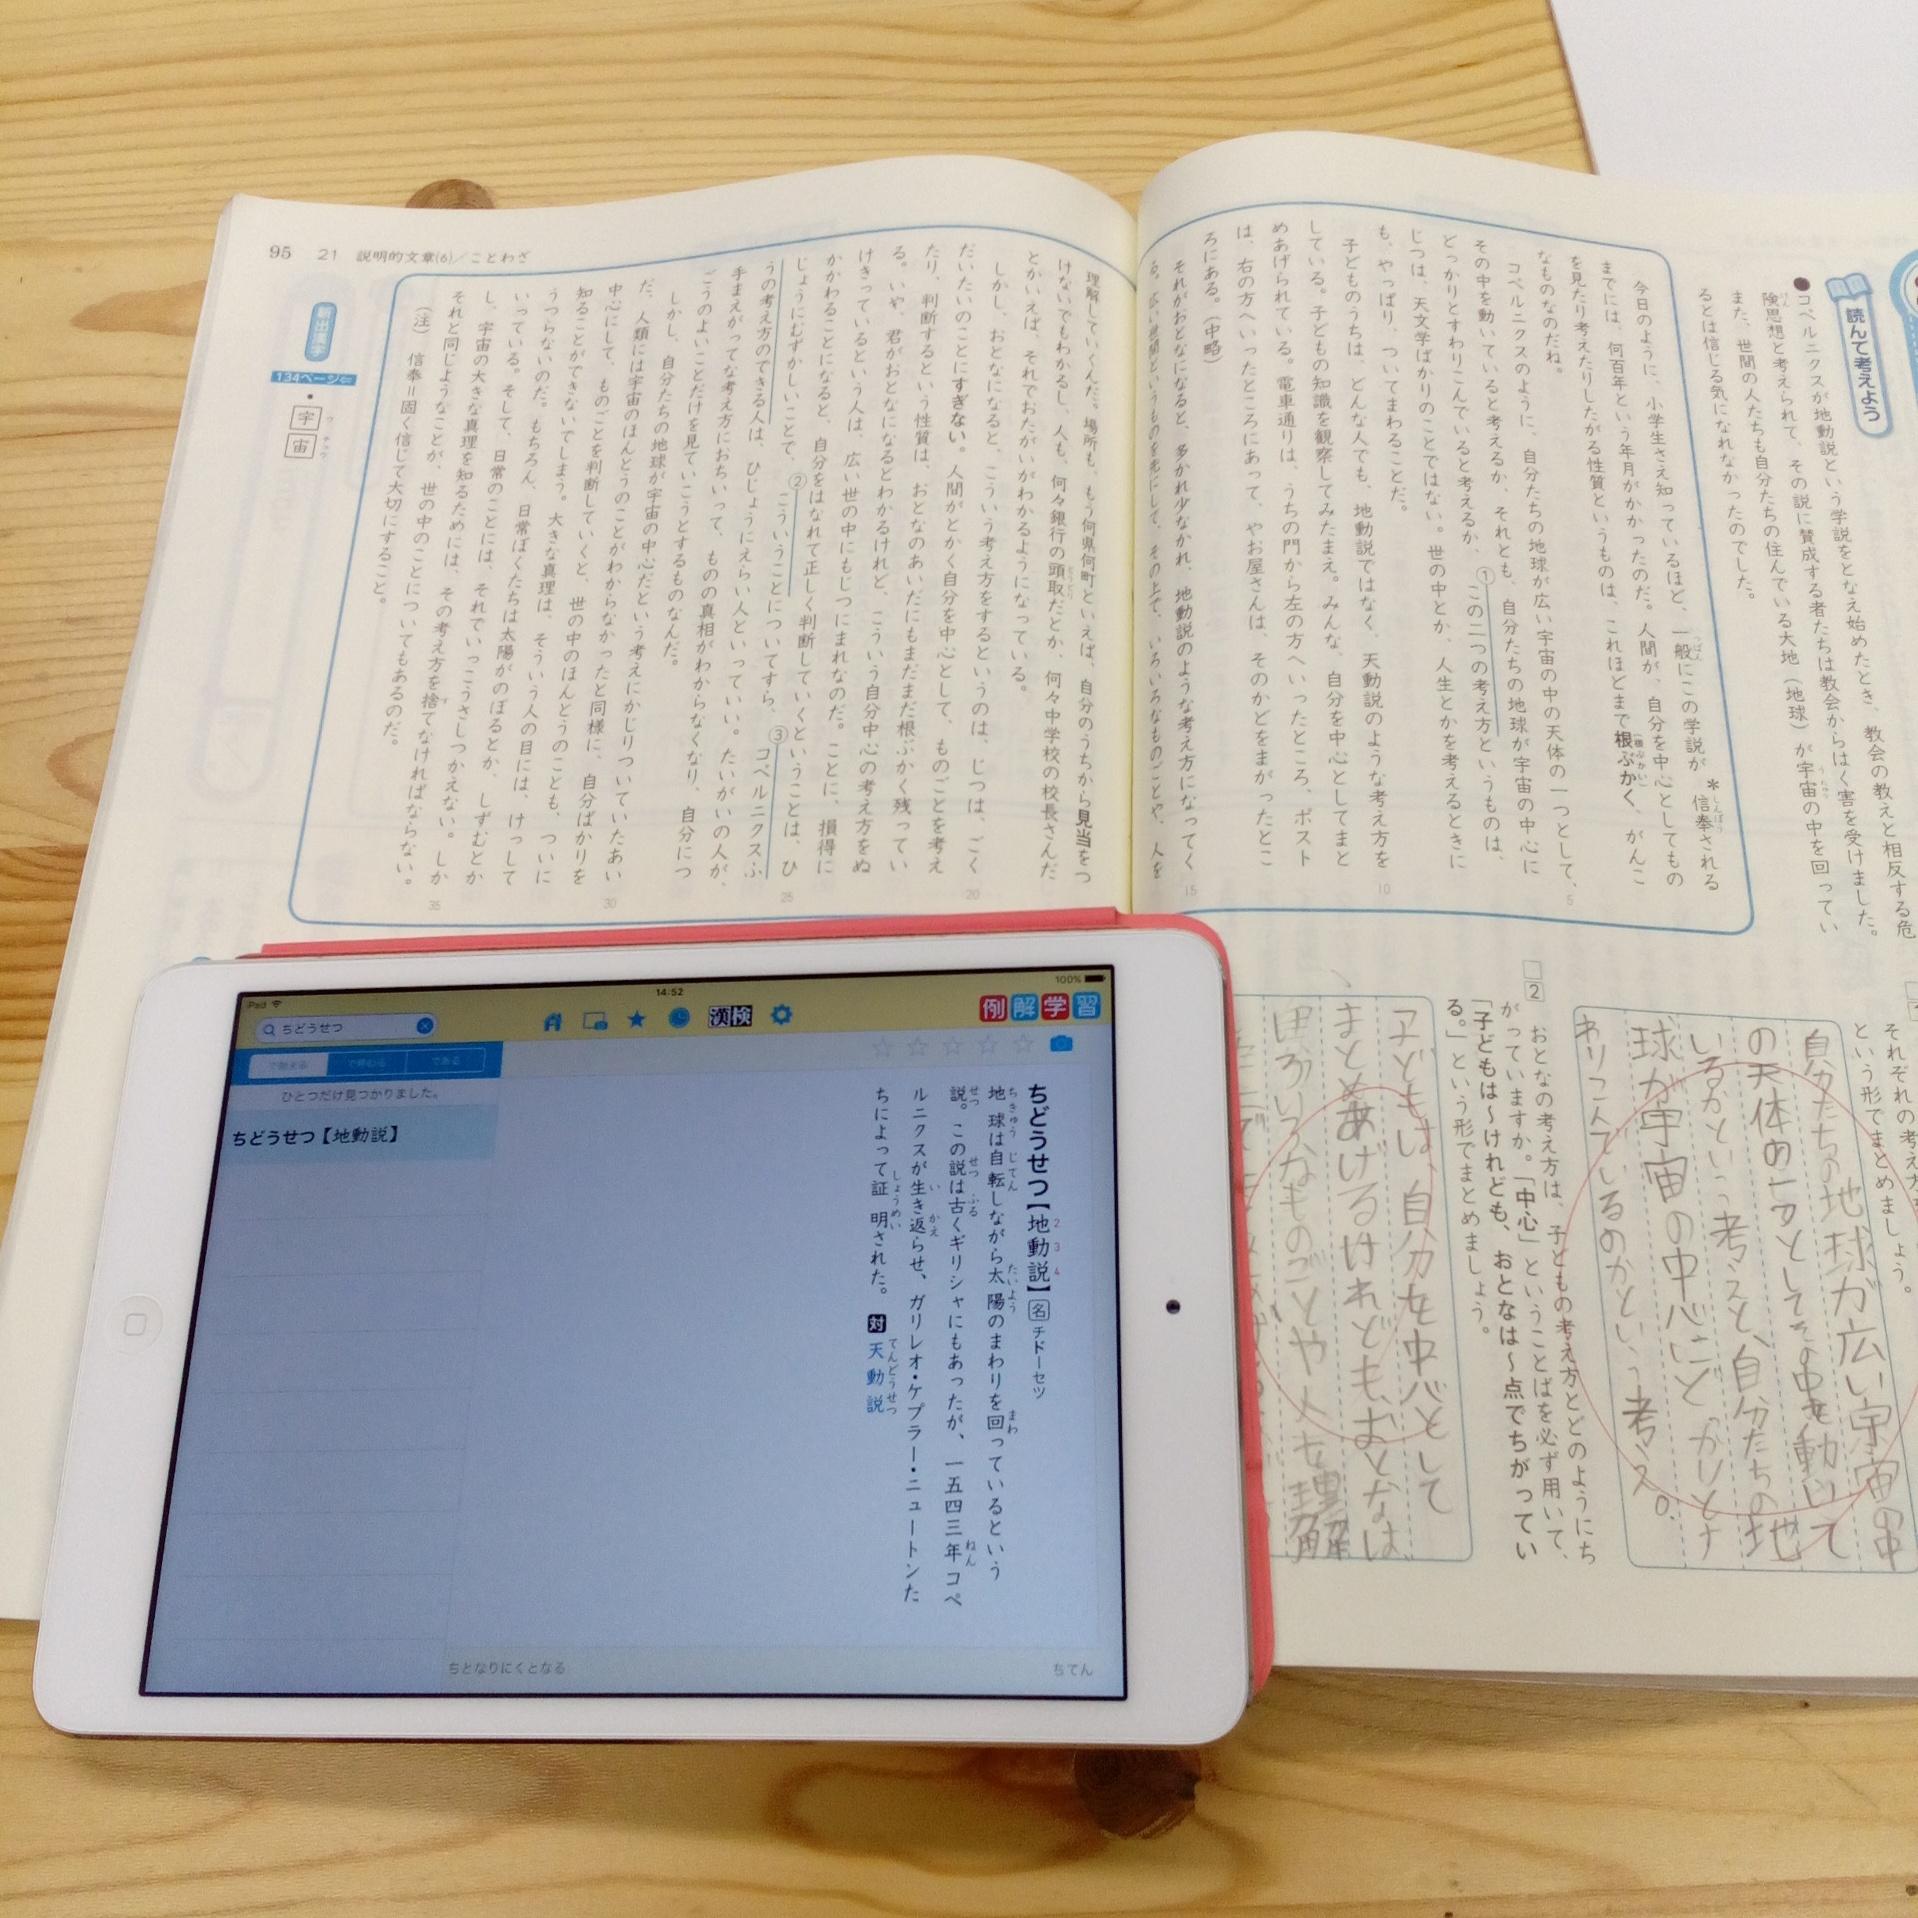 iPadで学習しようのイメージ